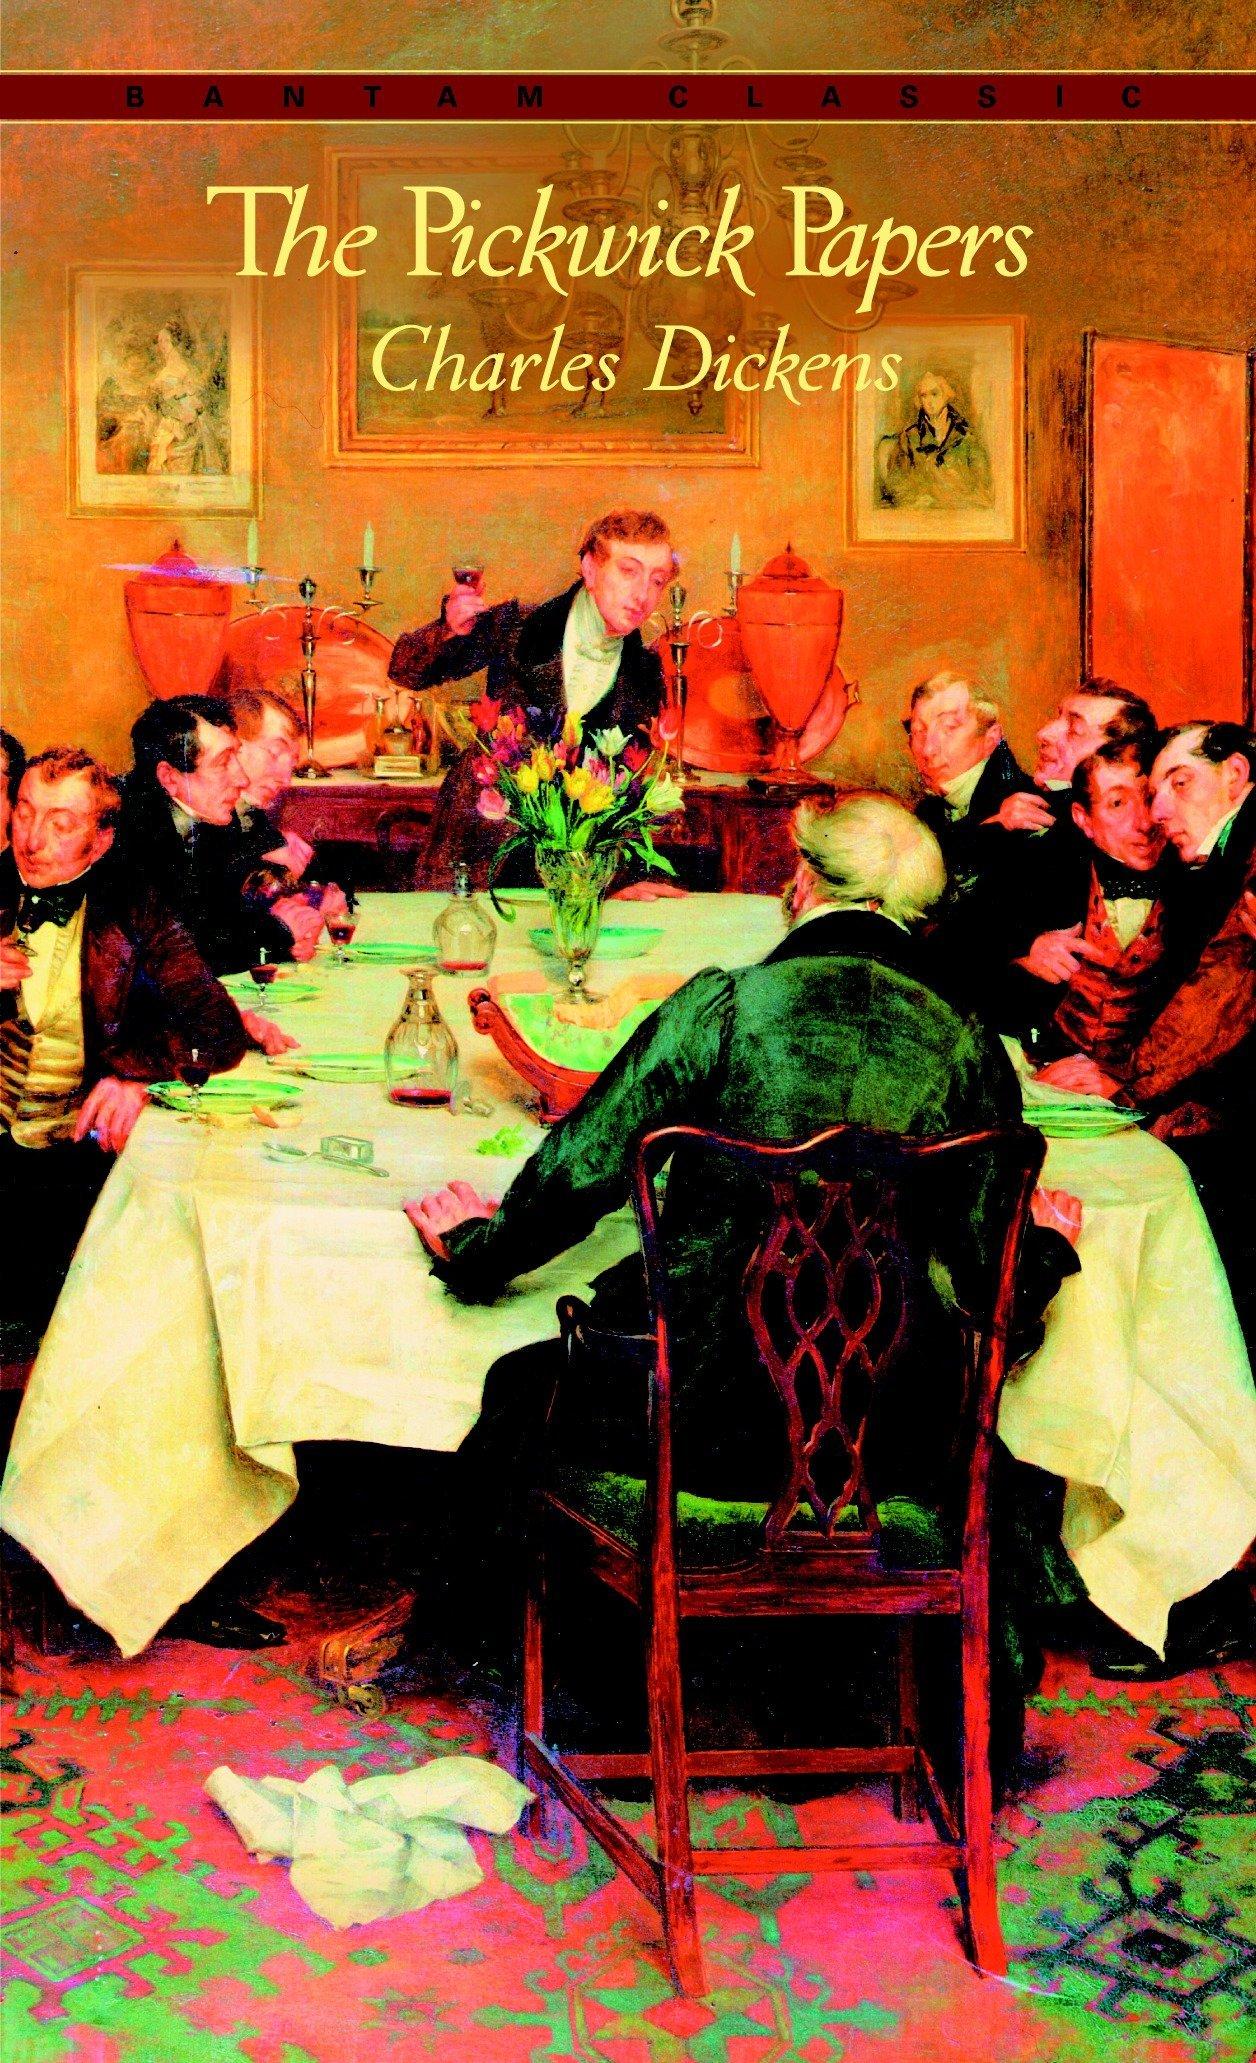 The Pickwick Papers (Classics): Amazon.es: Charles Dickens: Libros en idiomas extranjeros